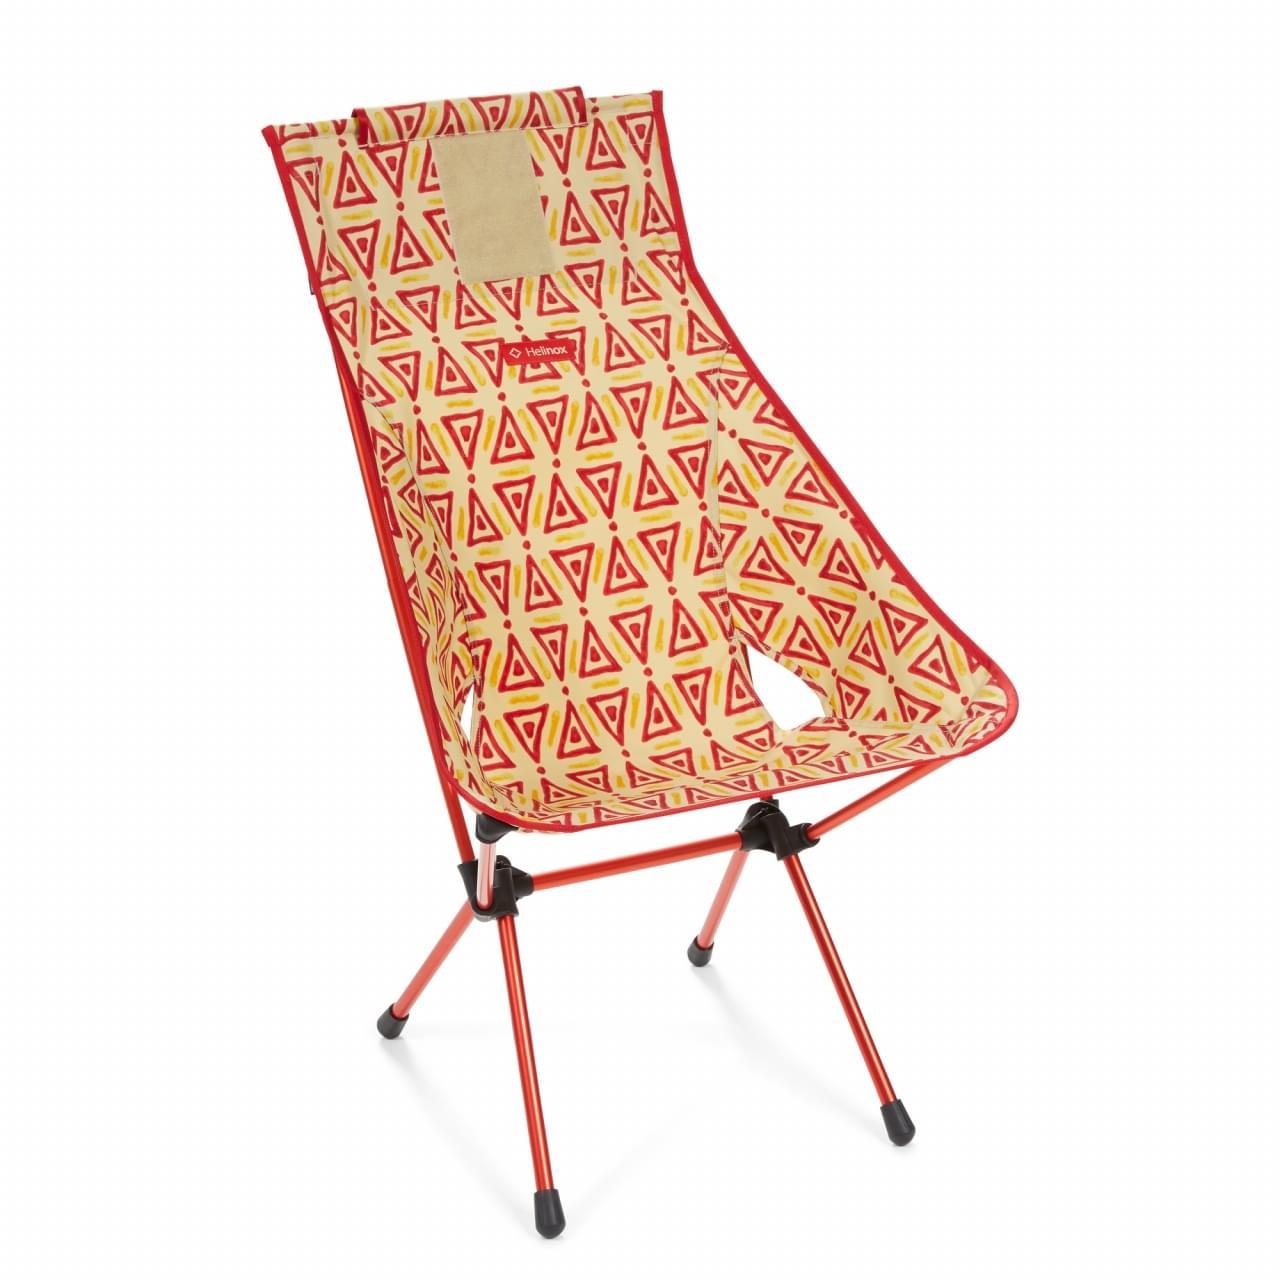 Helinox Sunset Chair Triangle Lichtgewicht Stoel - Rood